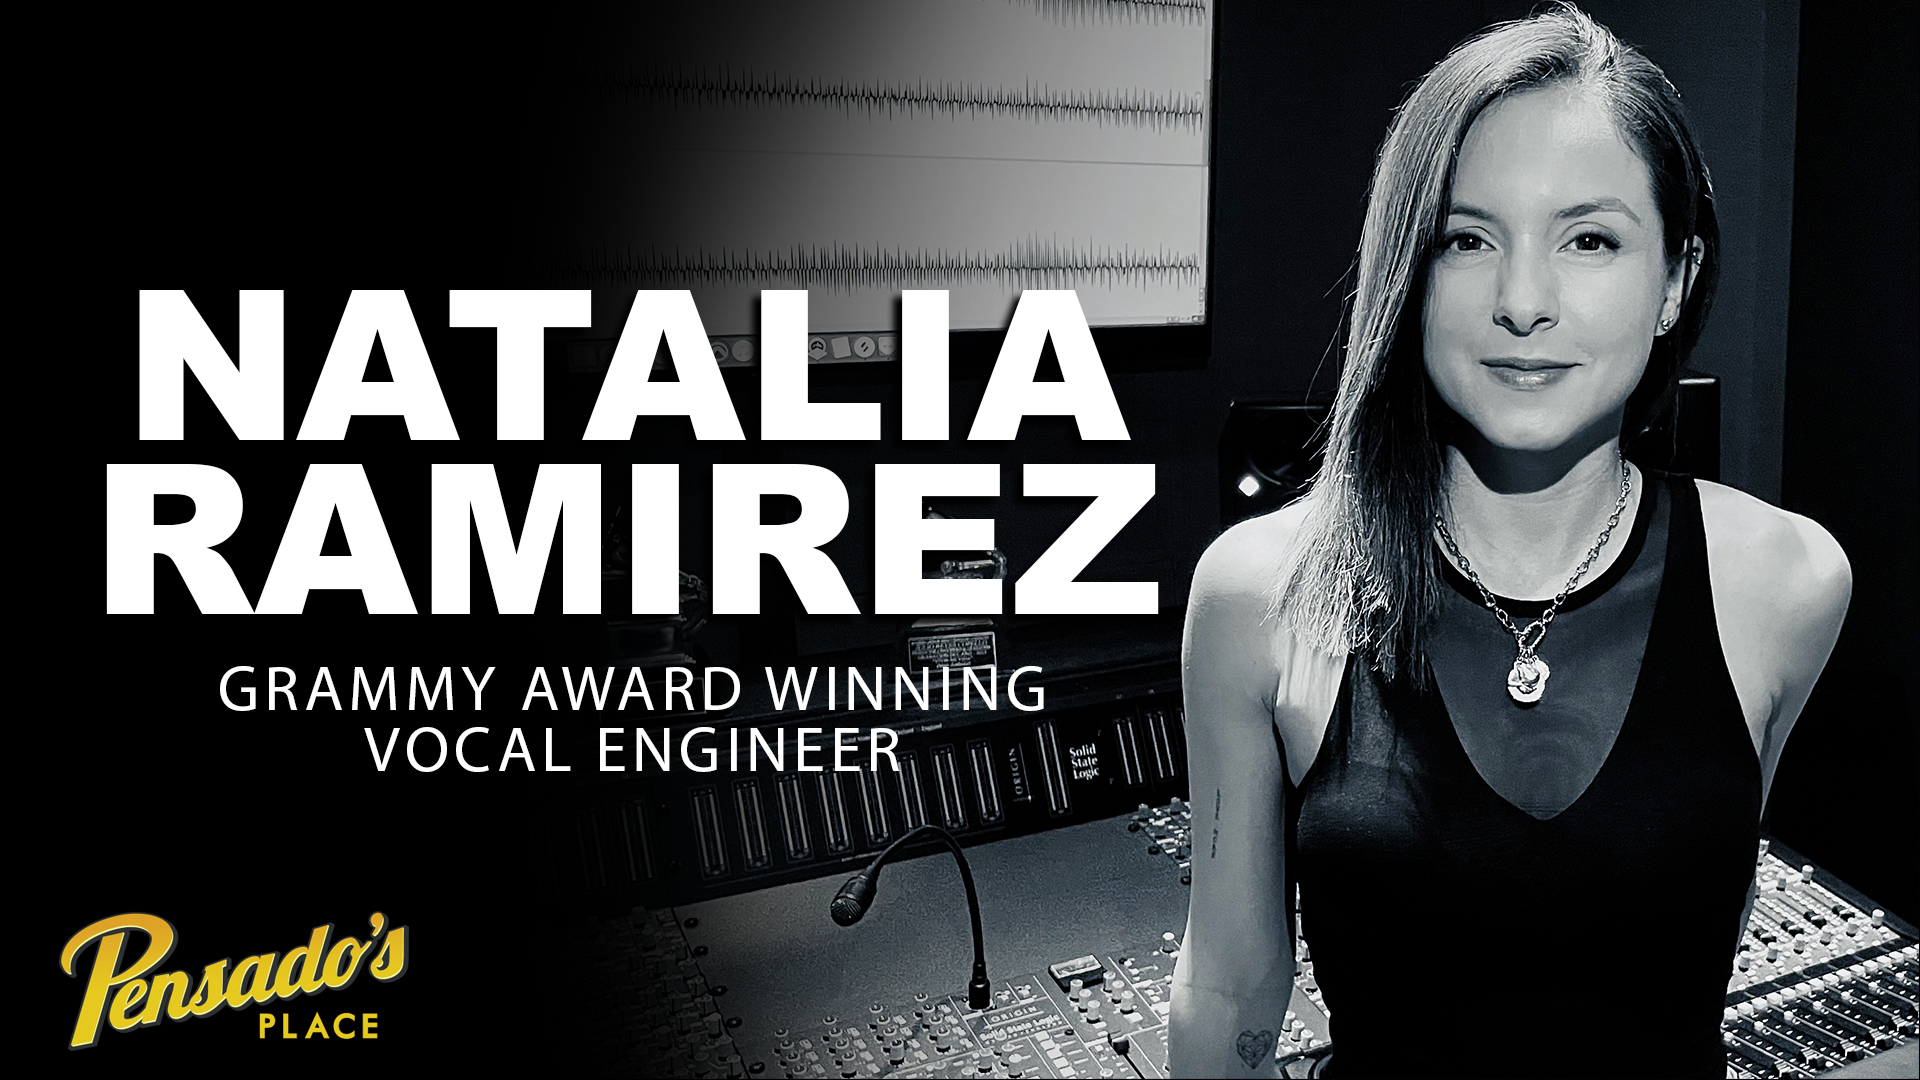 Grammy Award Winning Vocal Engineer, Natalia Ramirez